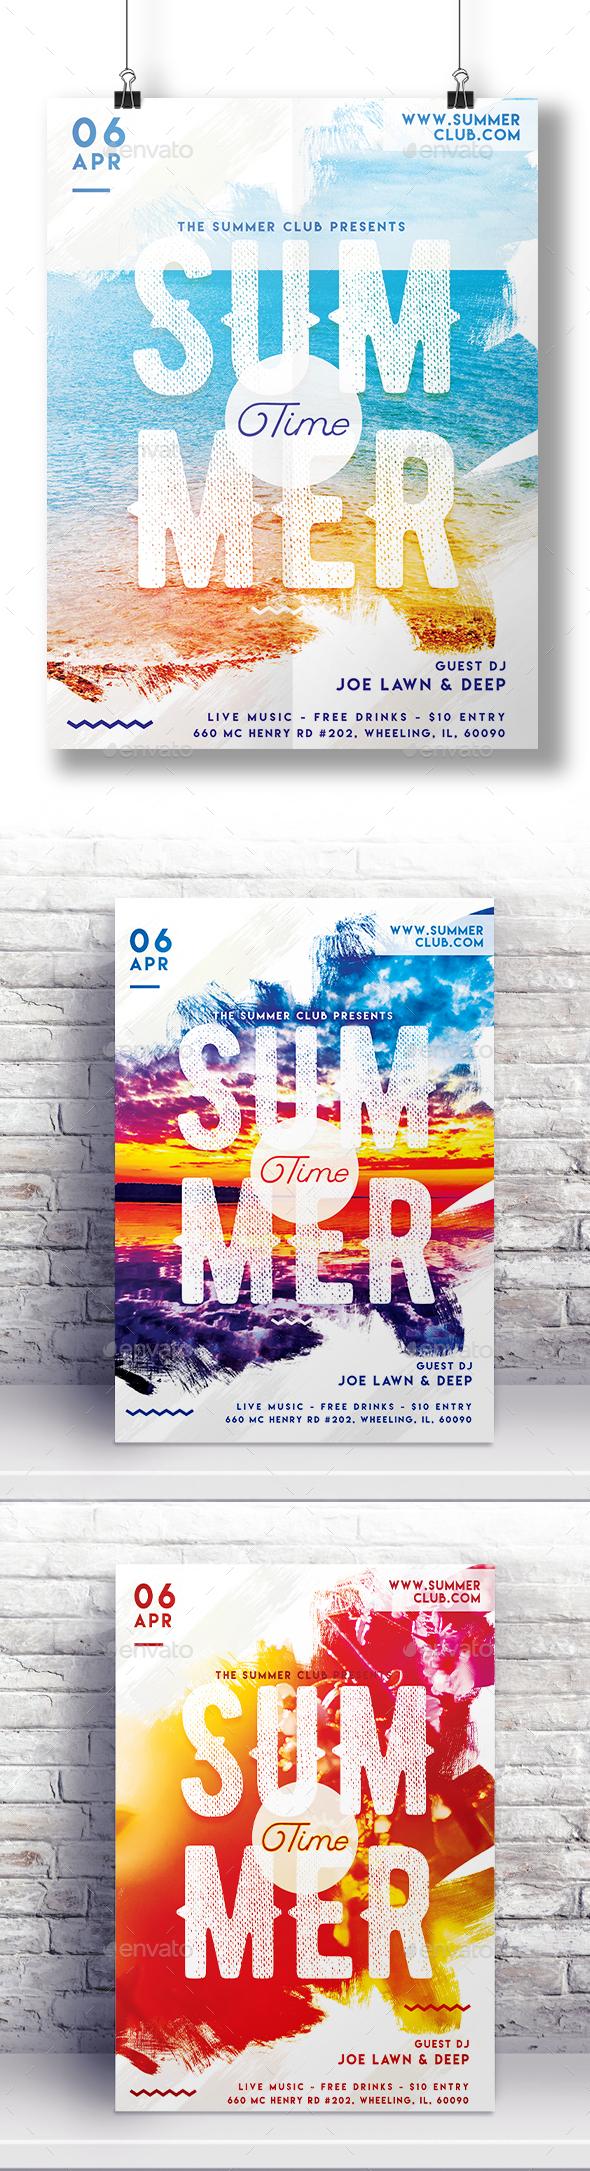 summer season time download